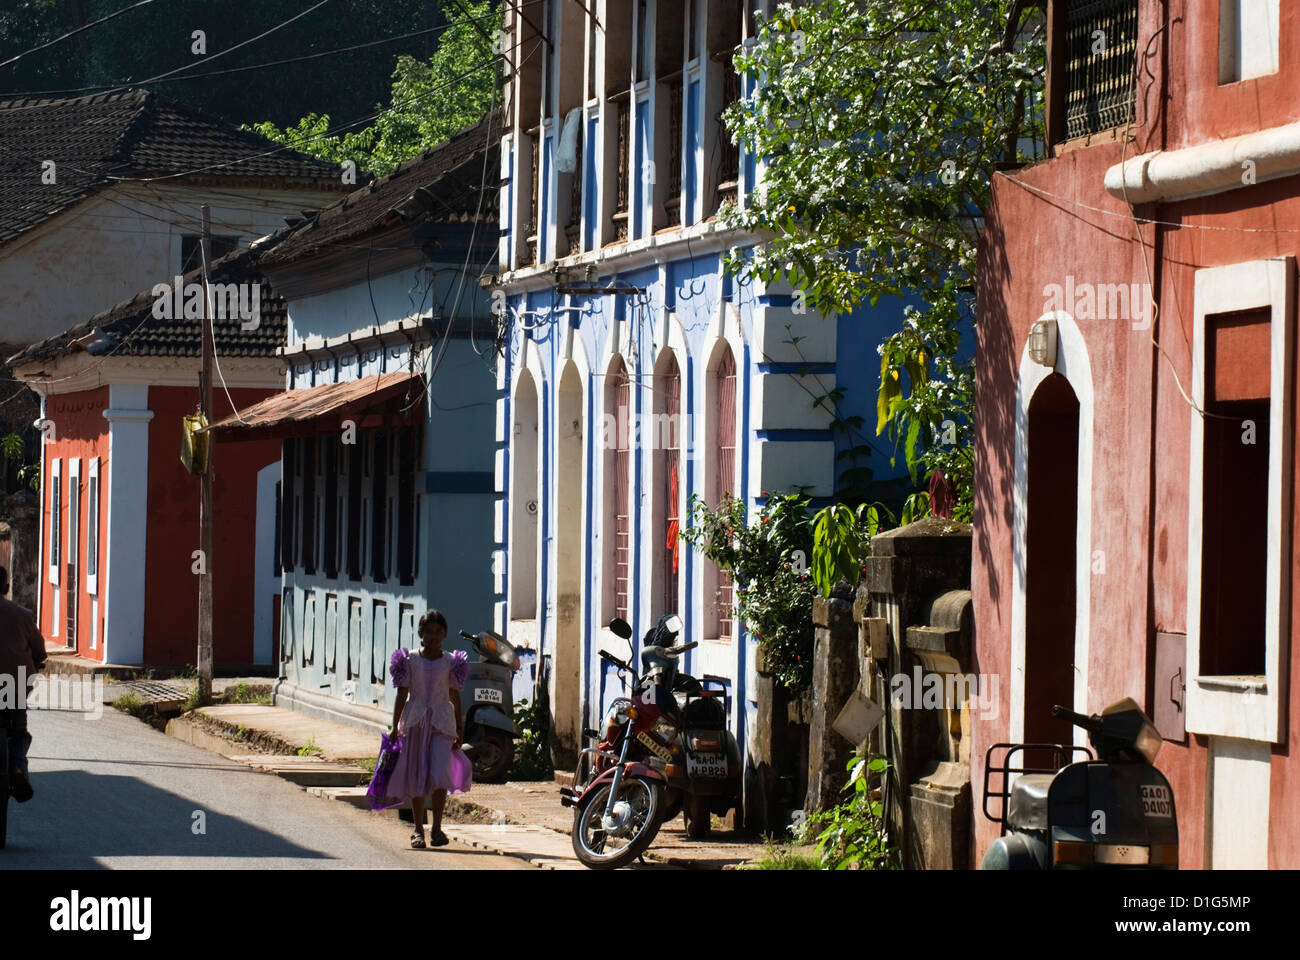 Street in the old quarter, Fontainhas, Panjim, Goa, India, Asia - Stock Image